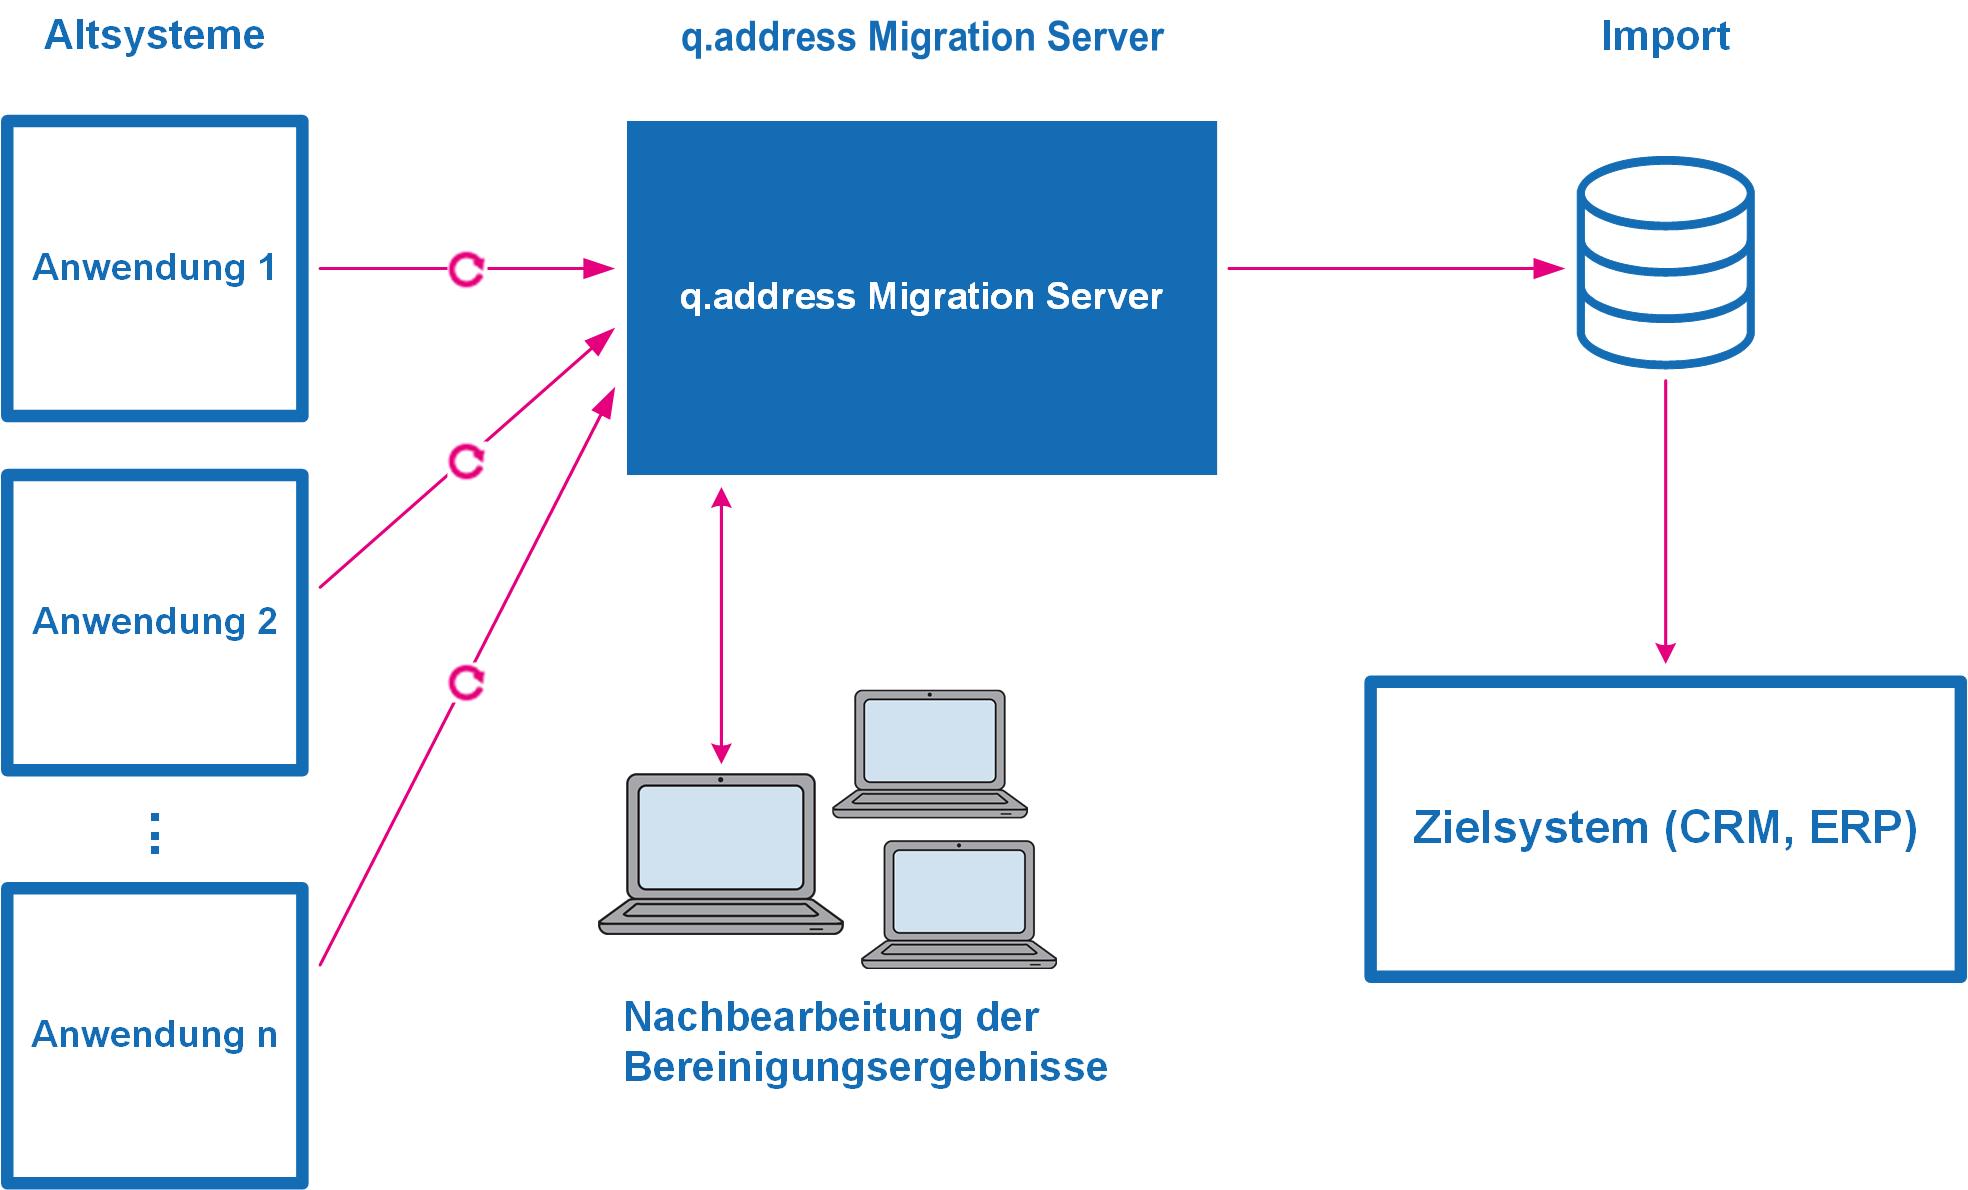 qaddress-Migration-Server